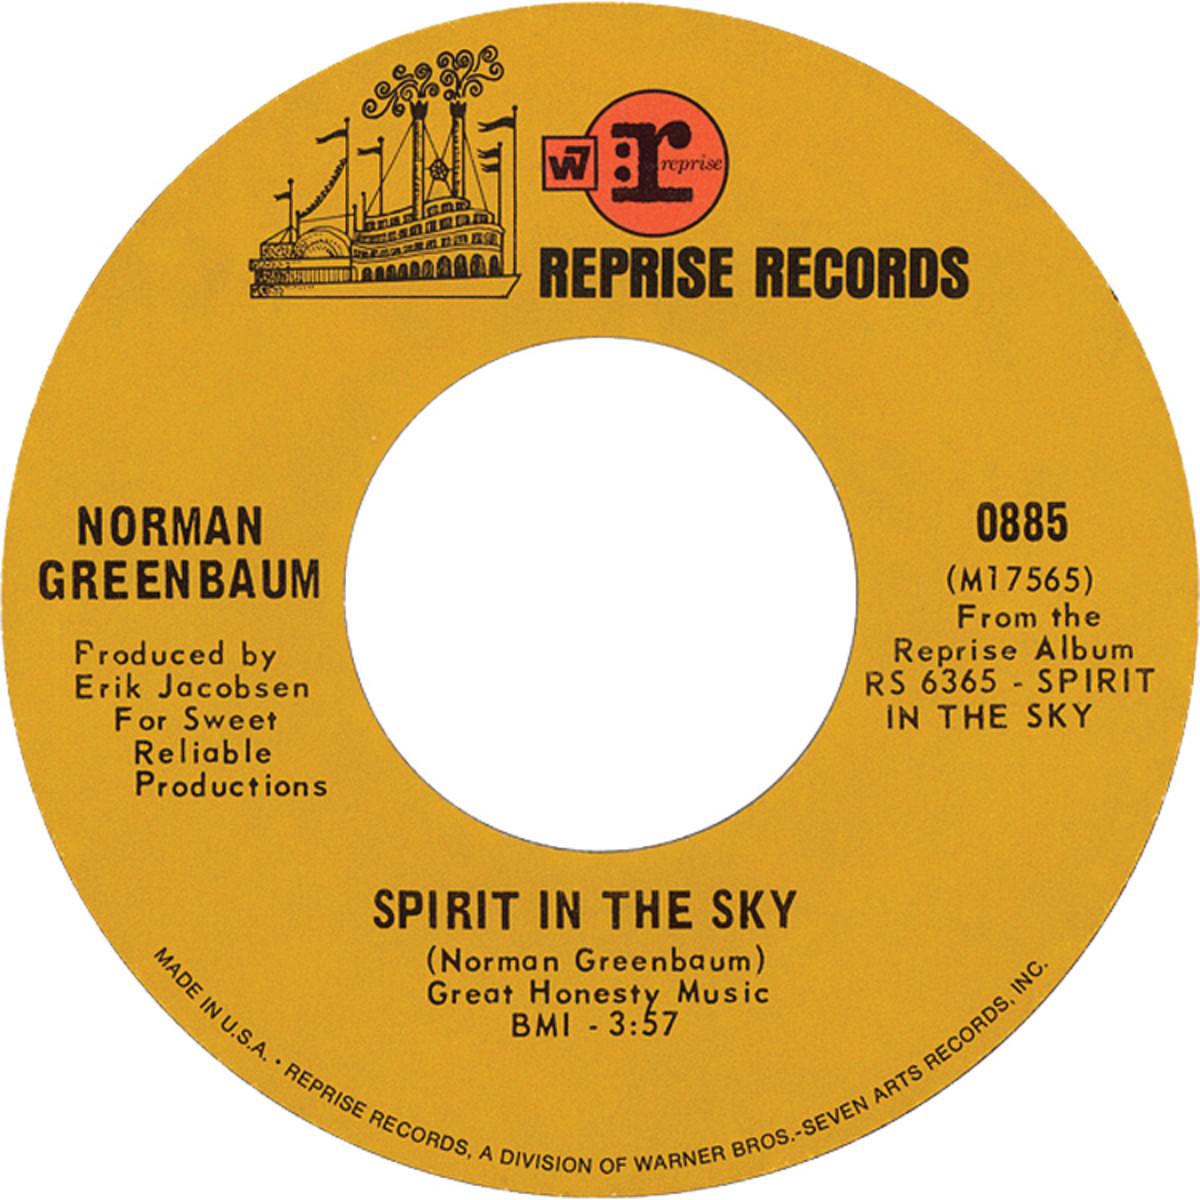 norman-greenbaum-spirit-in-the-sky-1969-7